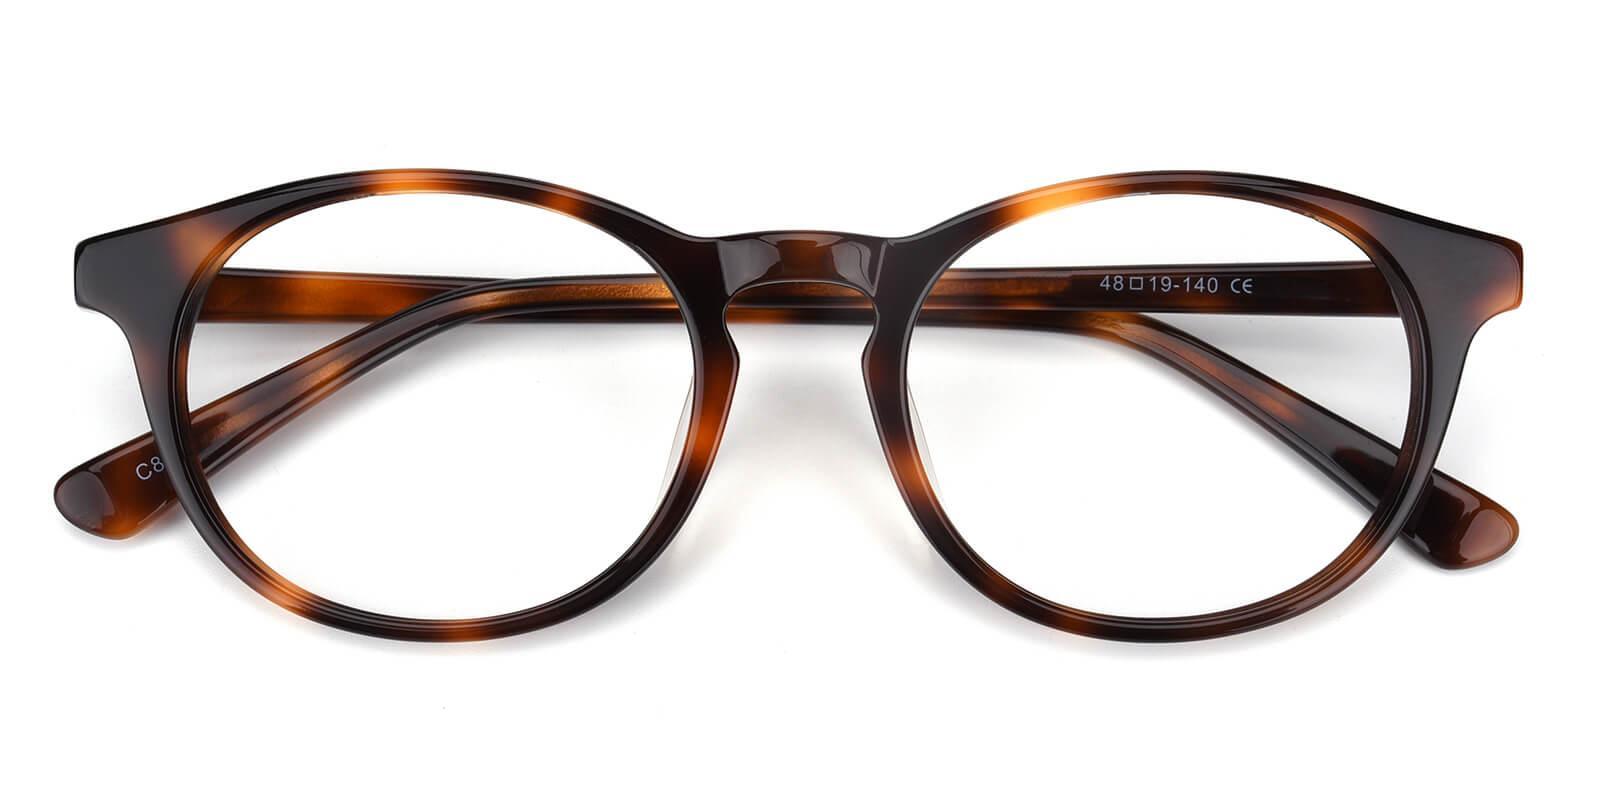 Concept-Tortoise-Oval-Acetate-Eyeglasses-detail